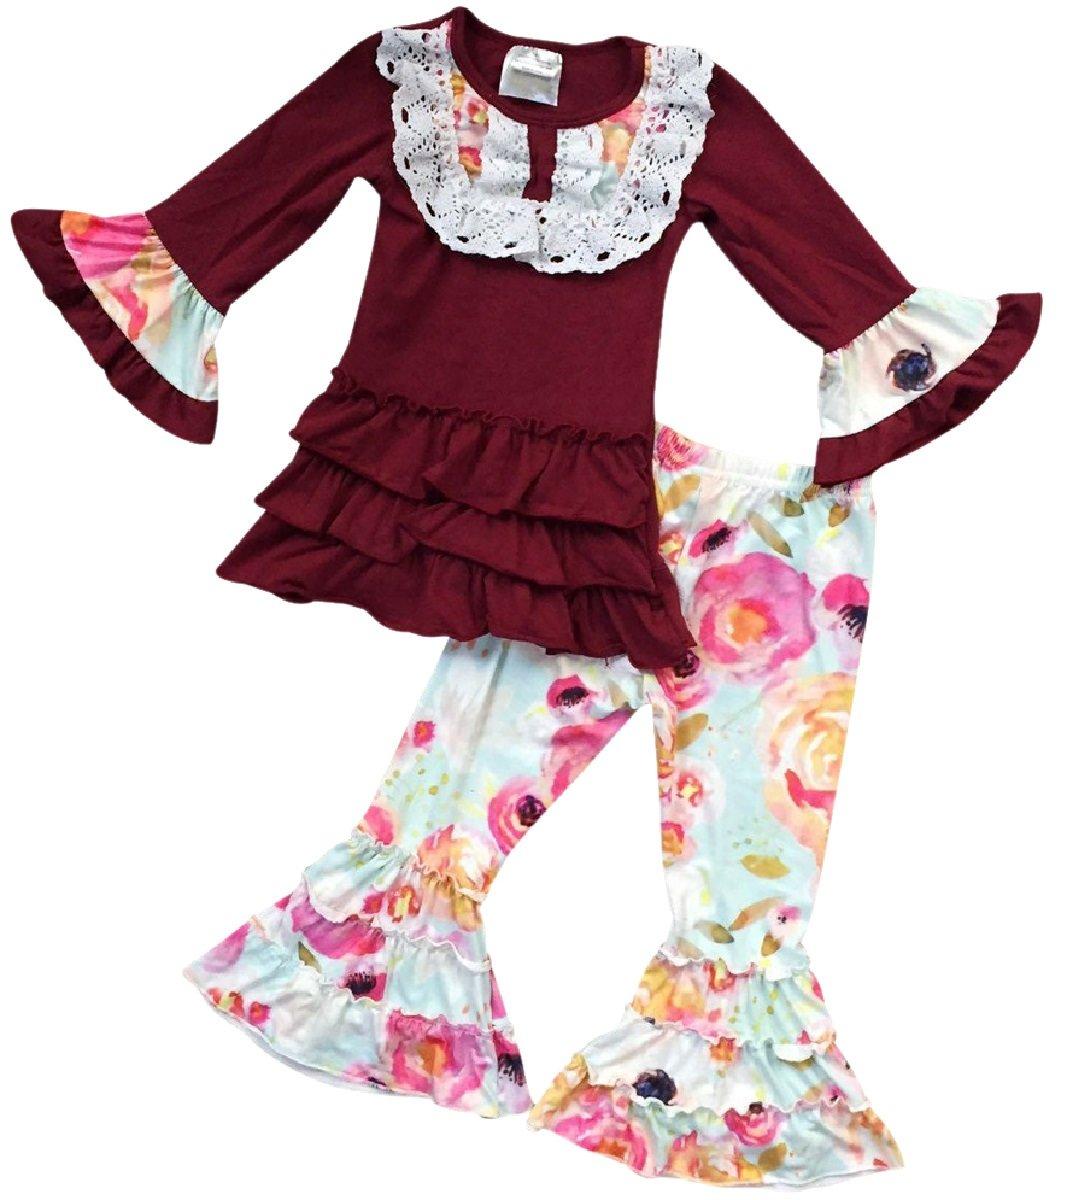 Little Girls 2 Pieces Set Long Sleeve Ruffle Shirt Floral Legging Pant Clothing Set Burgundy 4 M (201231)